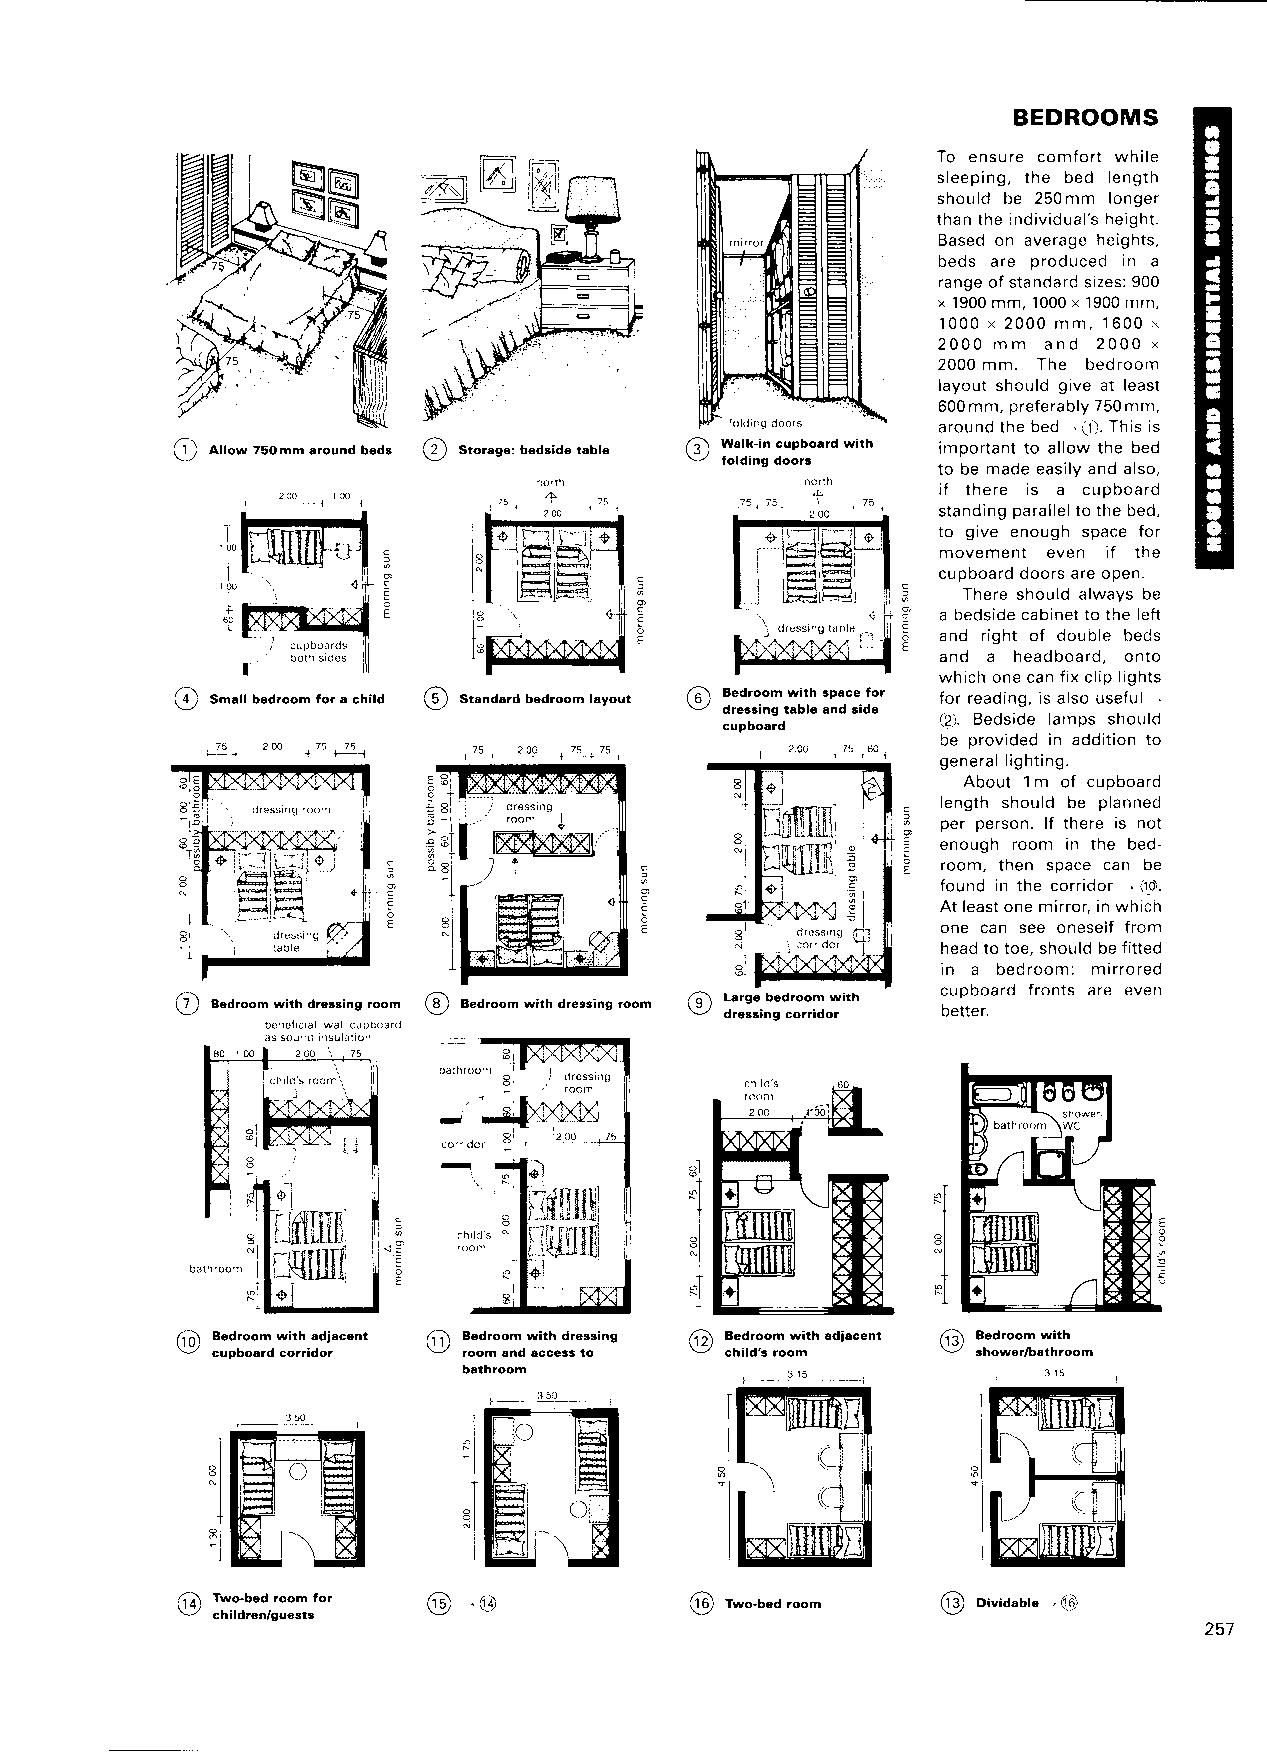 Neufert Architects Data Ed 3 Ernst Neufert Peter Neufert Free Download Borrow And Streaming Internet Archive Architect Data Architect Architecture